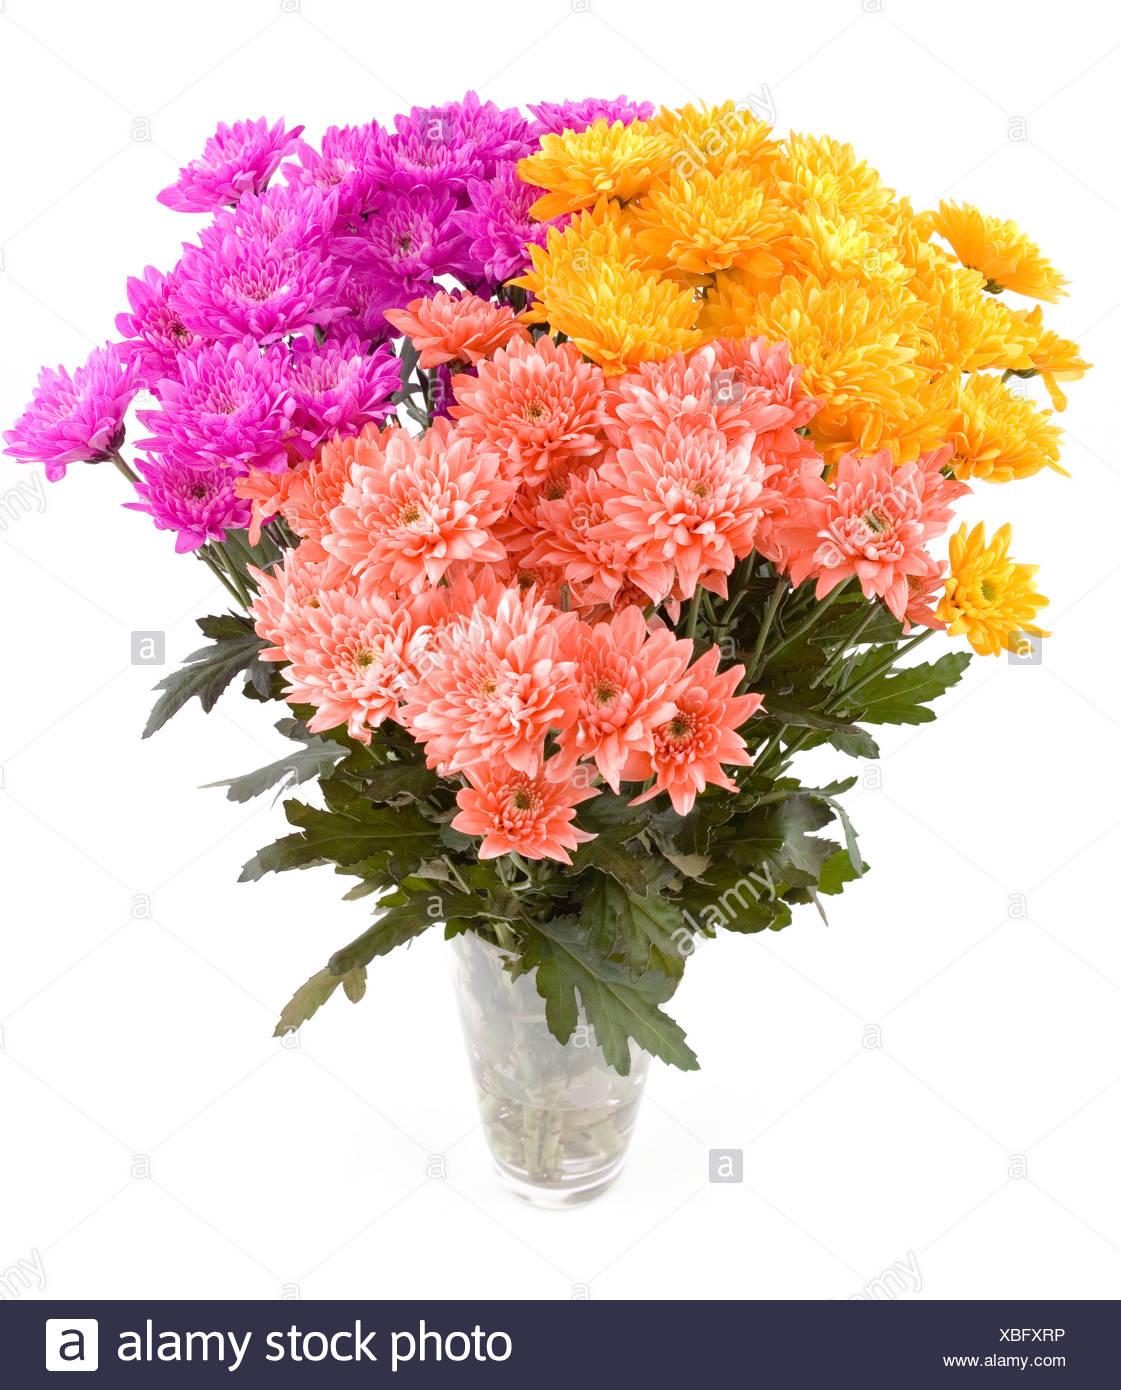 Chrysanthemum - Stock Image